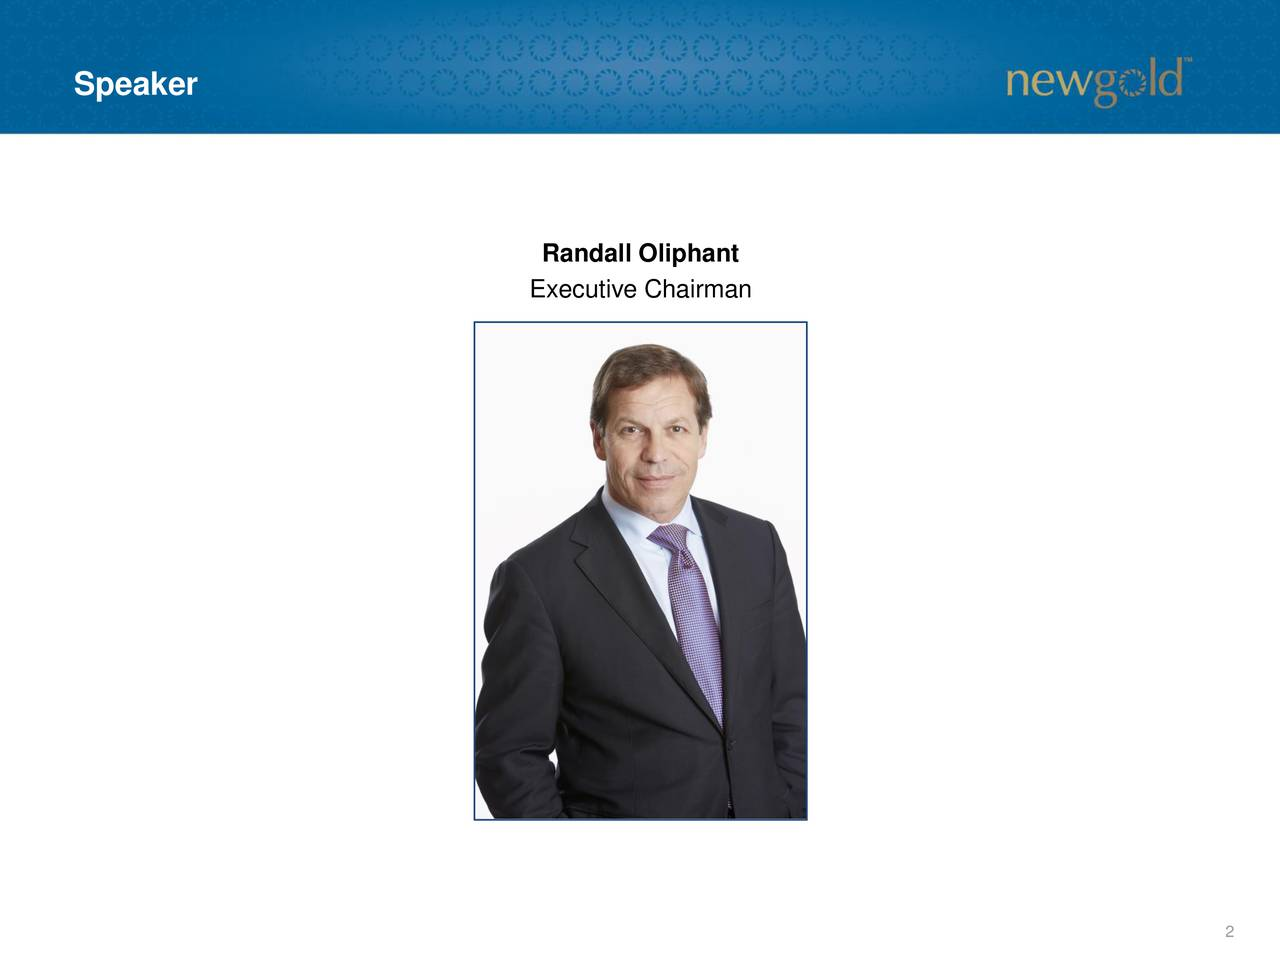 Randall Oliphant Executive Chairman 2